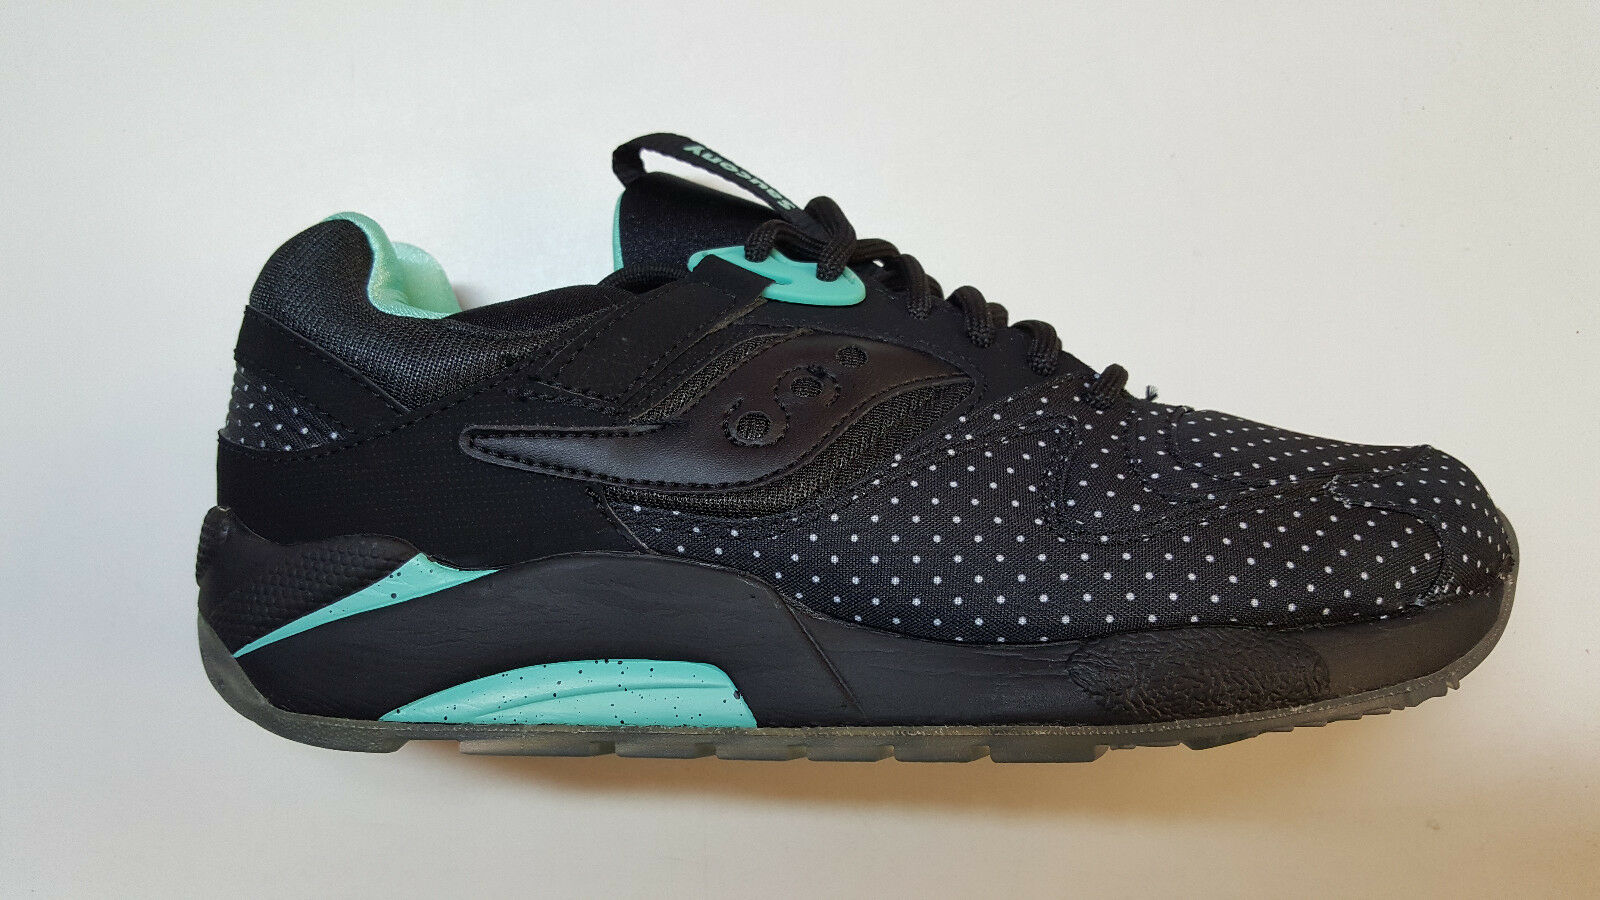 Saucony Grid 9000 Microdot Pack noir Aqua Teal hommes Sneakers S70256-3 1703-91